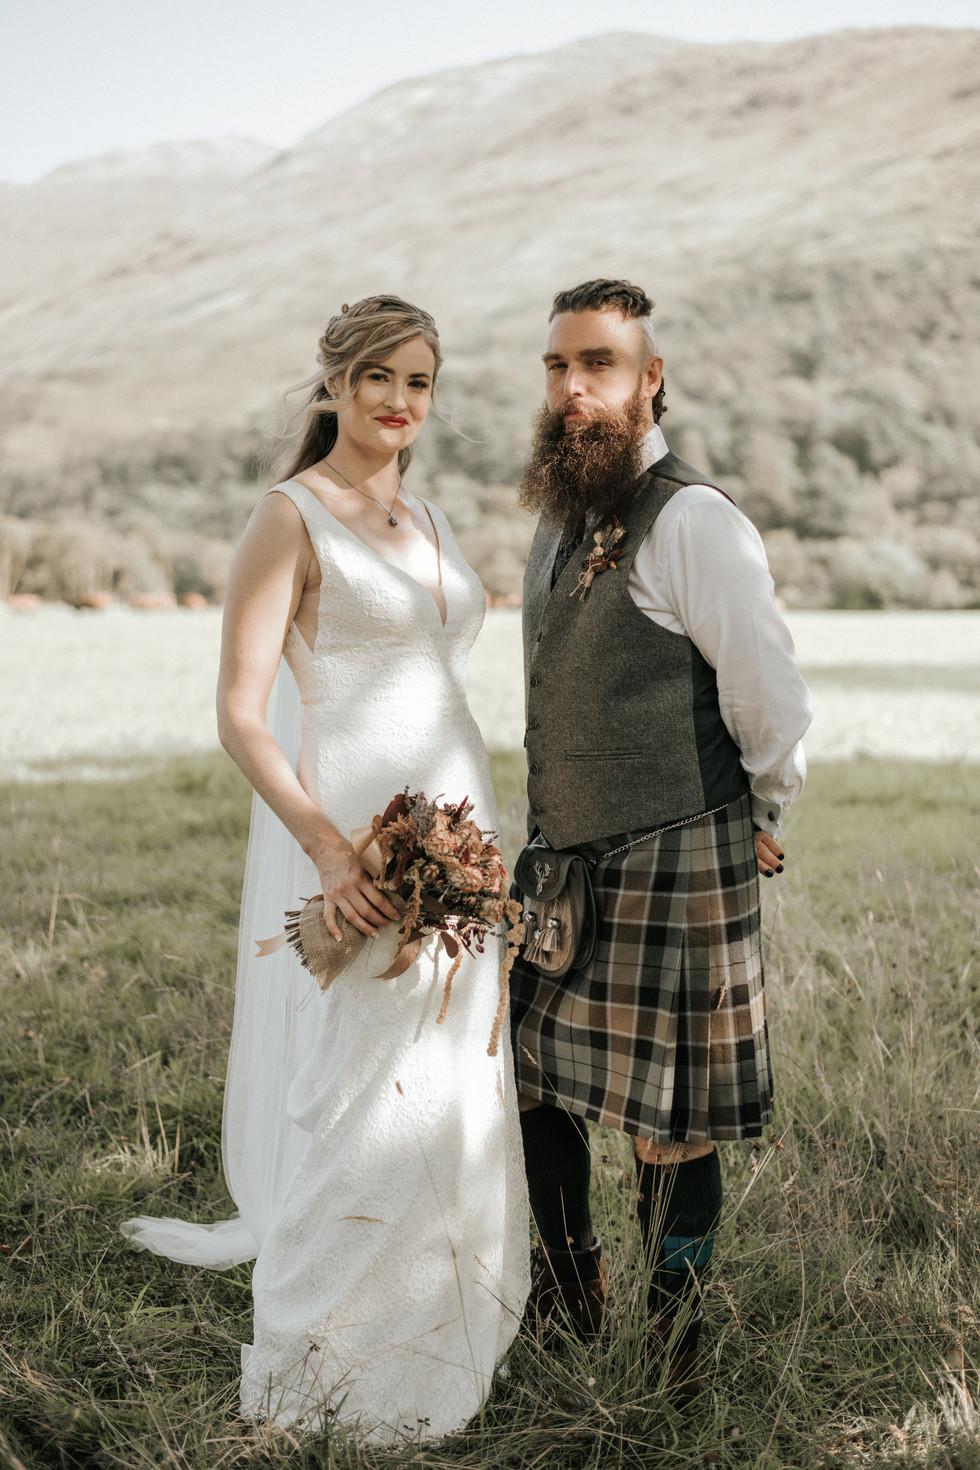 Erin & David's beautiful August elopement. Mihaela Bodlovic Photography